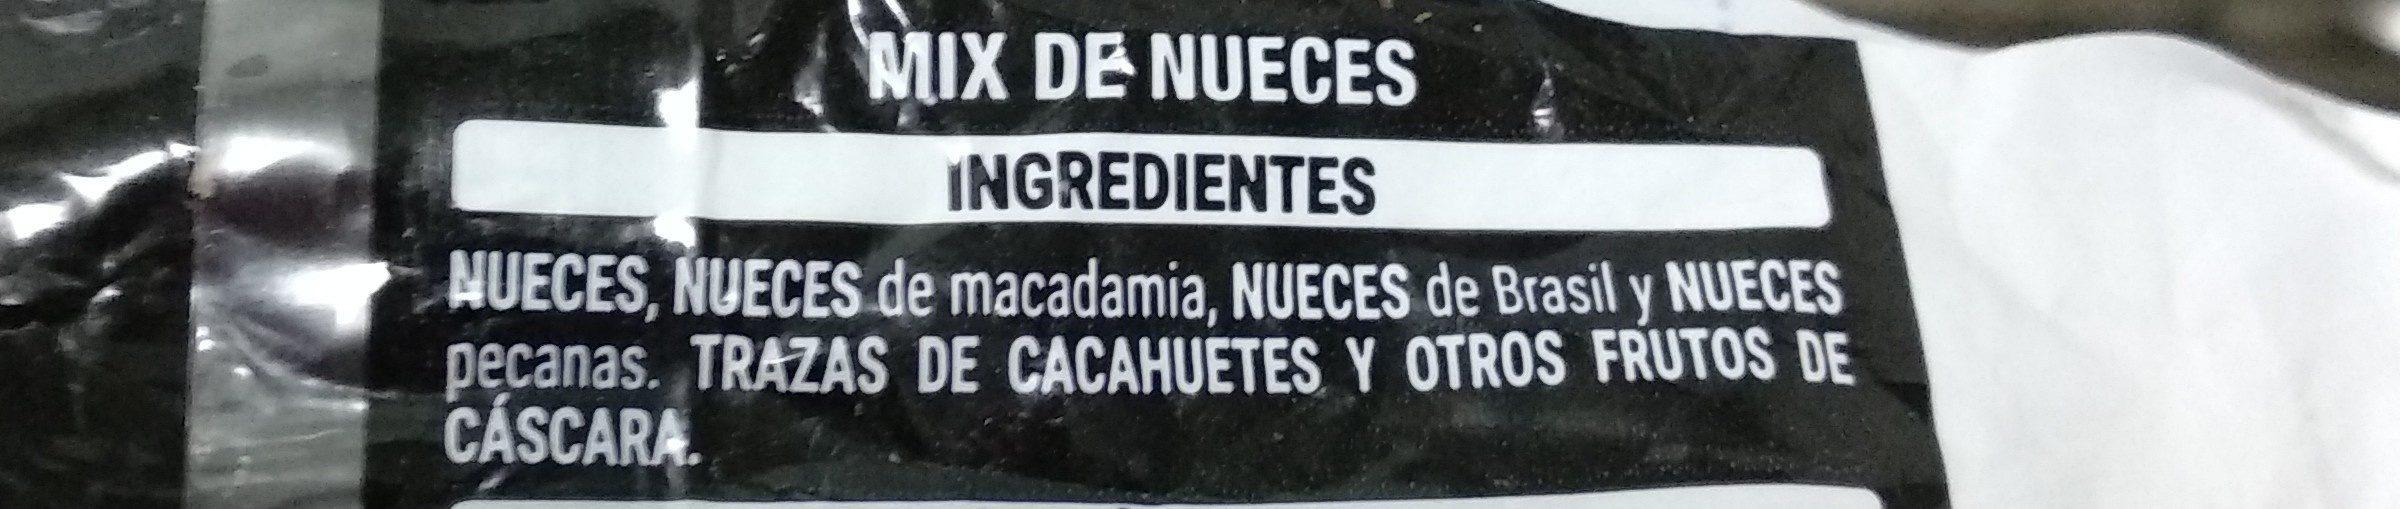 Mix Nueces Naturales - Ingrediënten